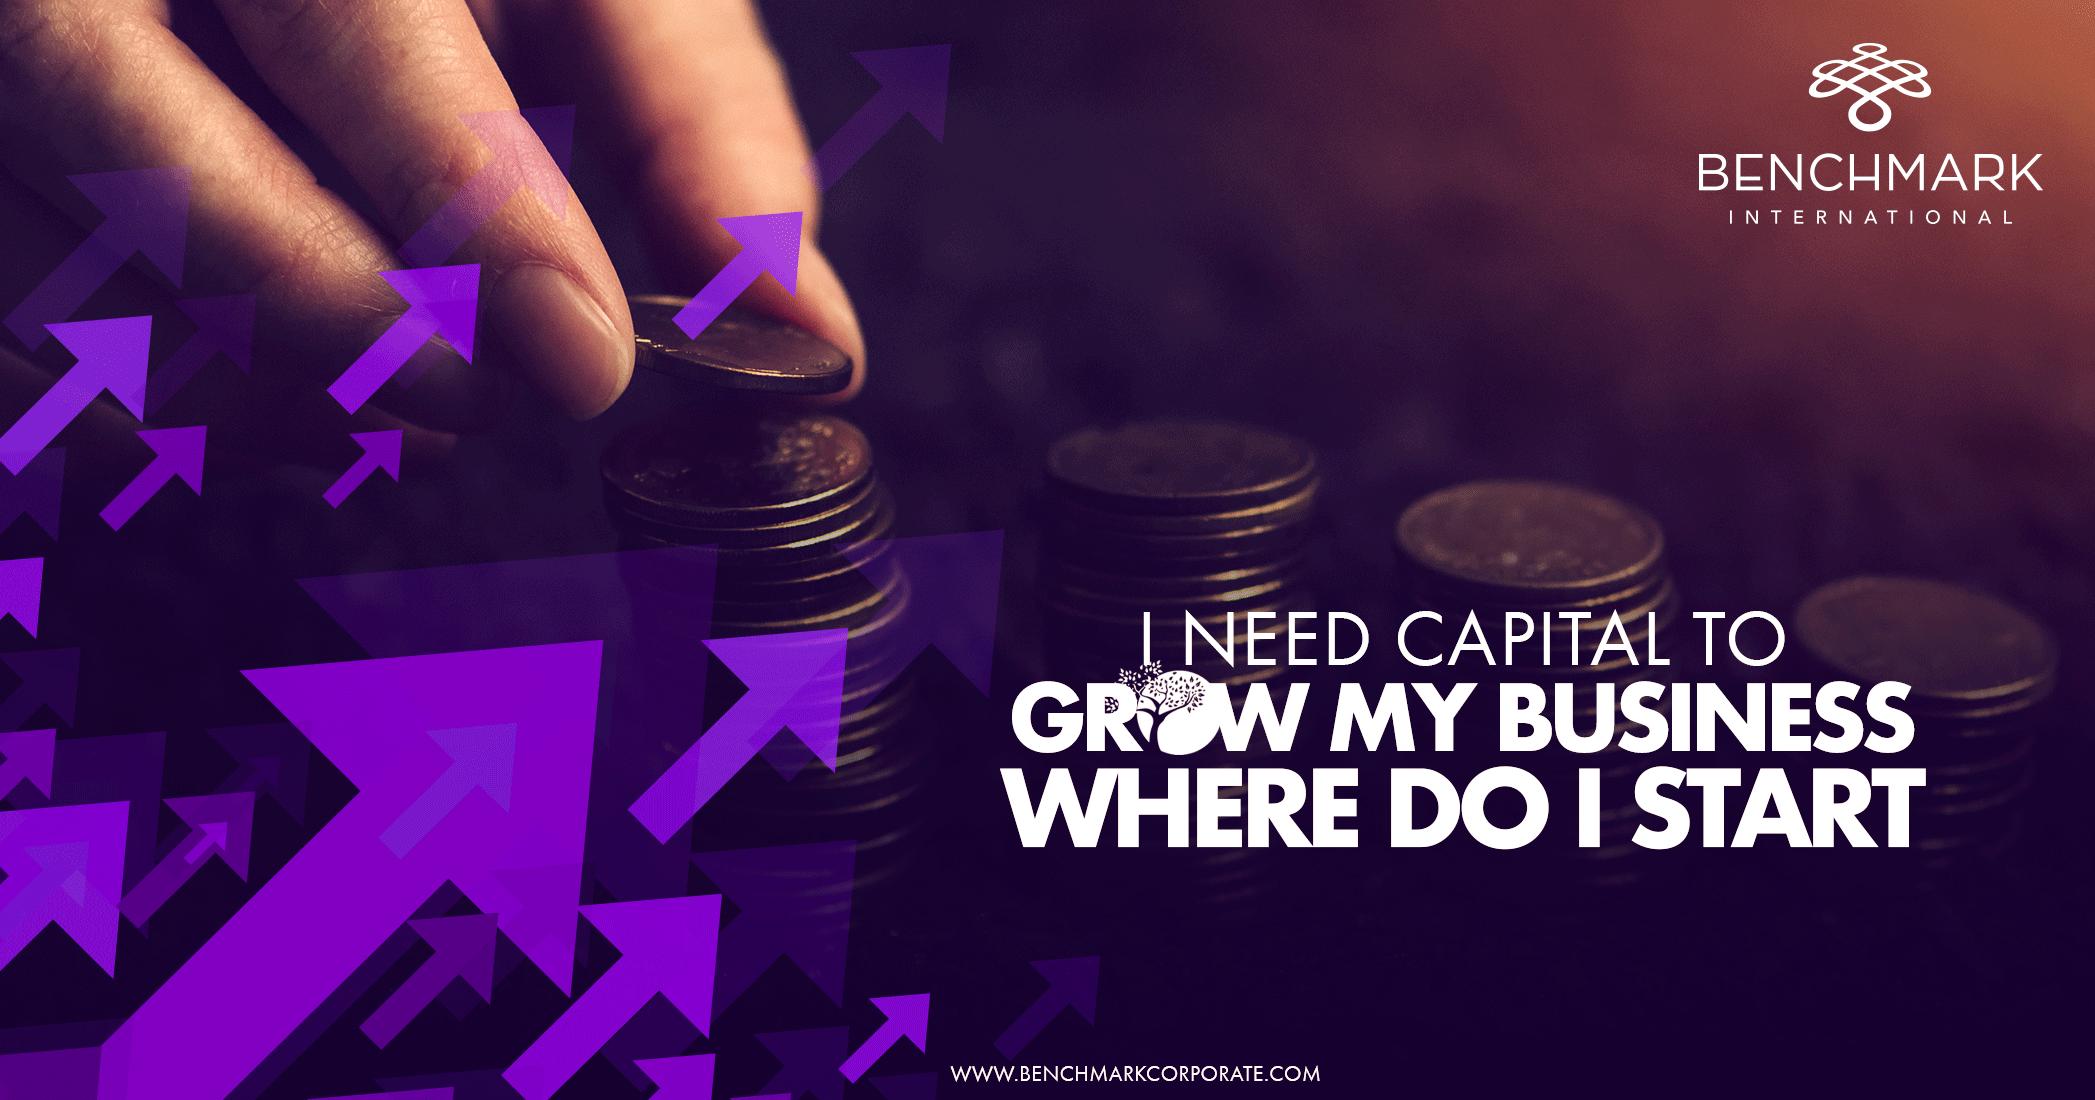 Benchmark-International-Grow-my-Business-Blog